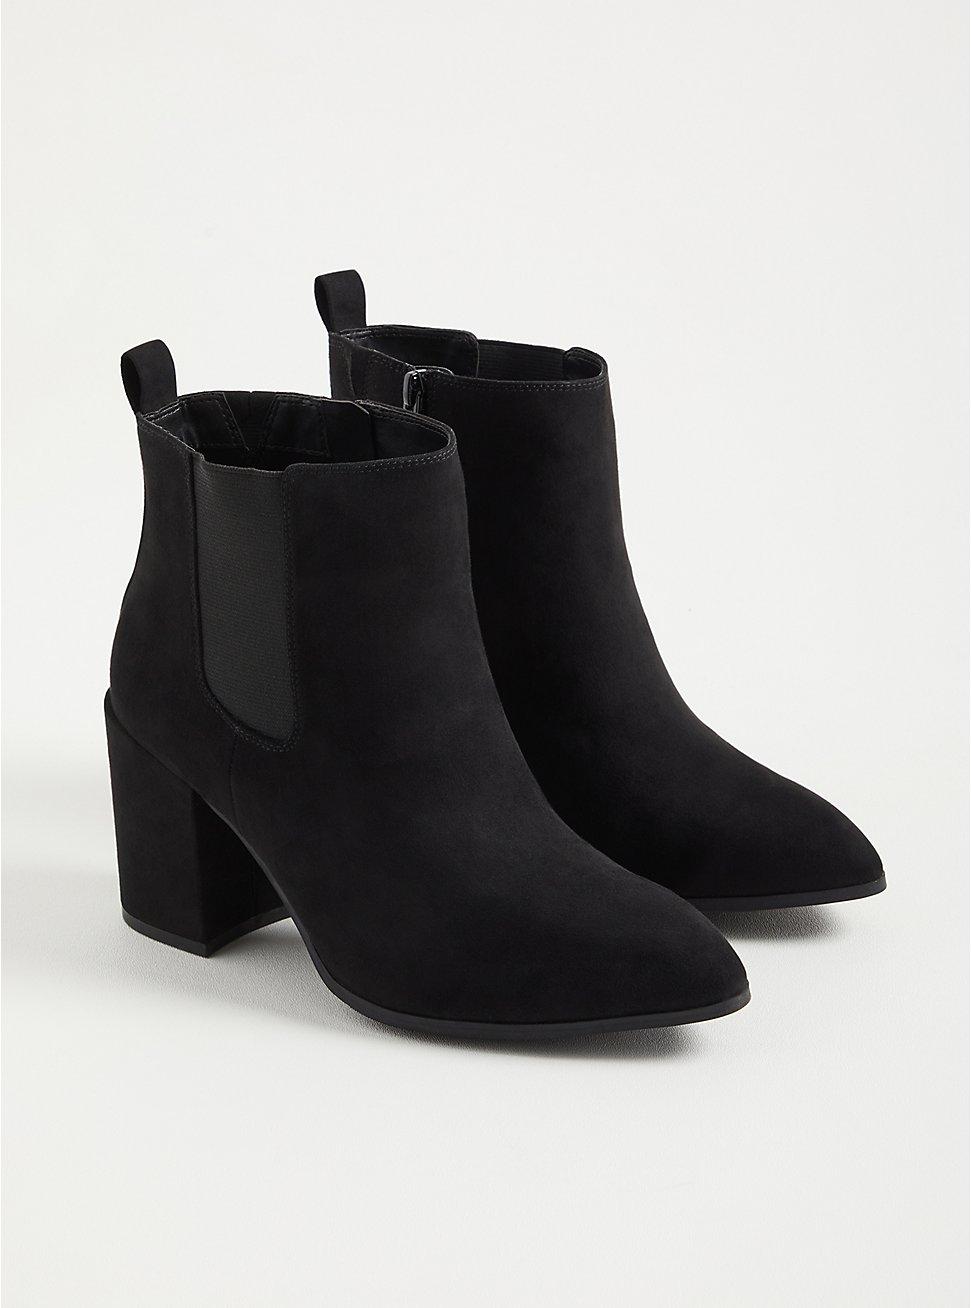 Pointed Toe Heeled Bootie - Black Faux Suede  (WW), BLACK, hi-res